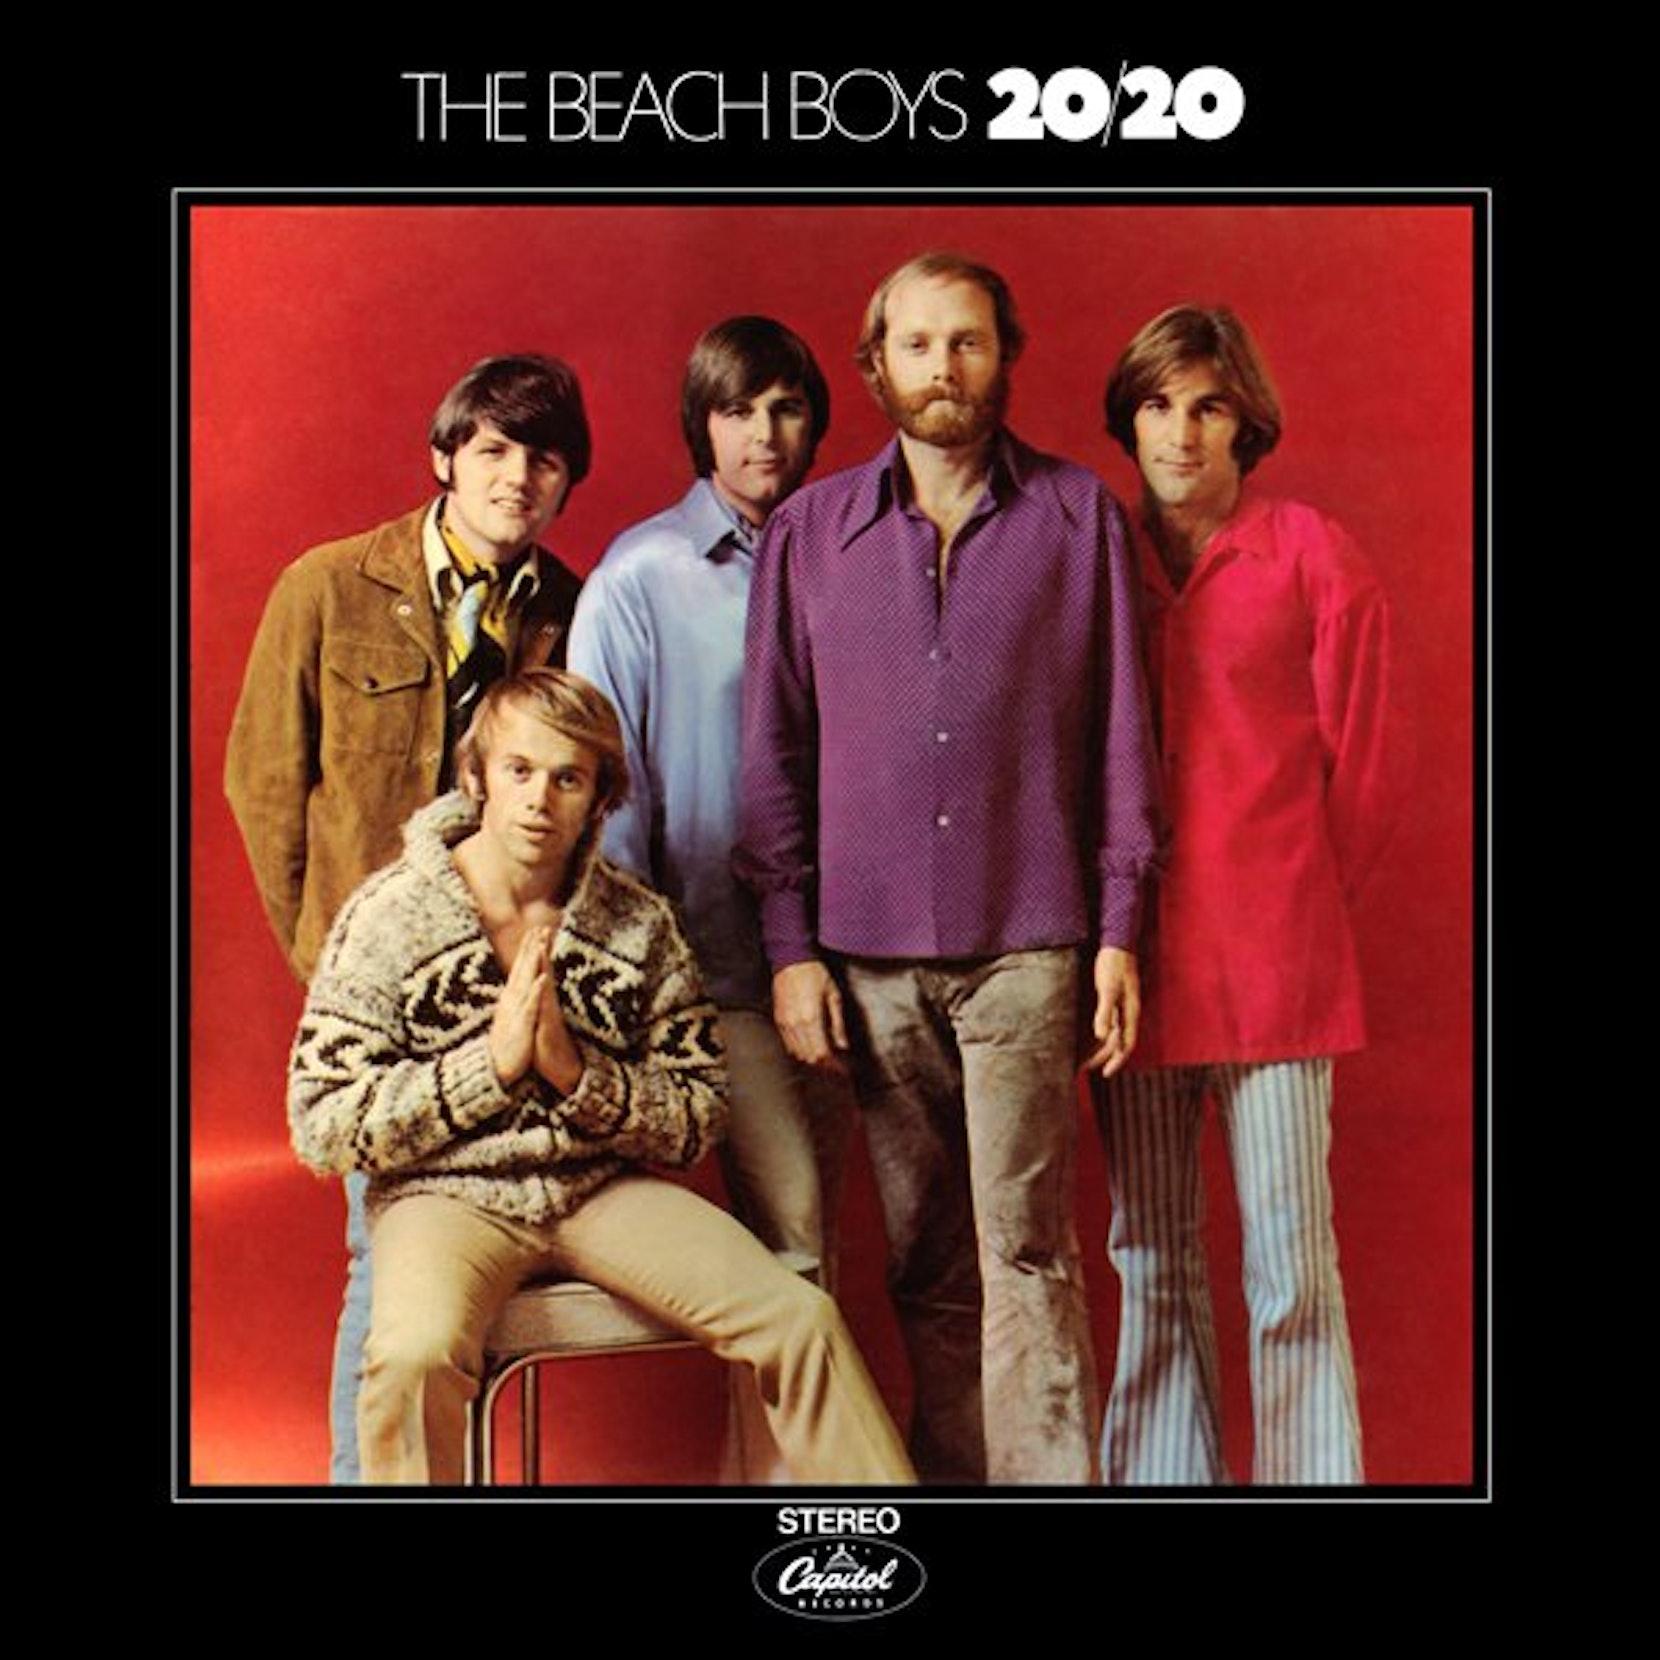 10 Best Beach Boys Albums To Own On Vinyl Vinyl Me Please